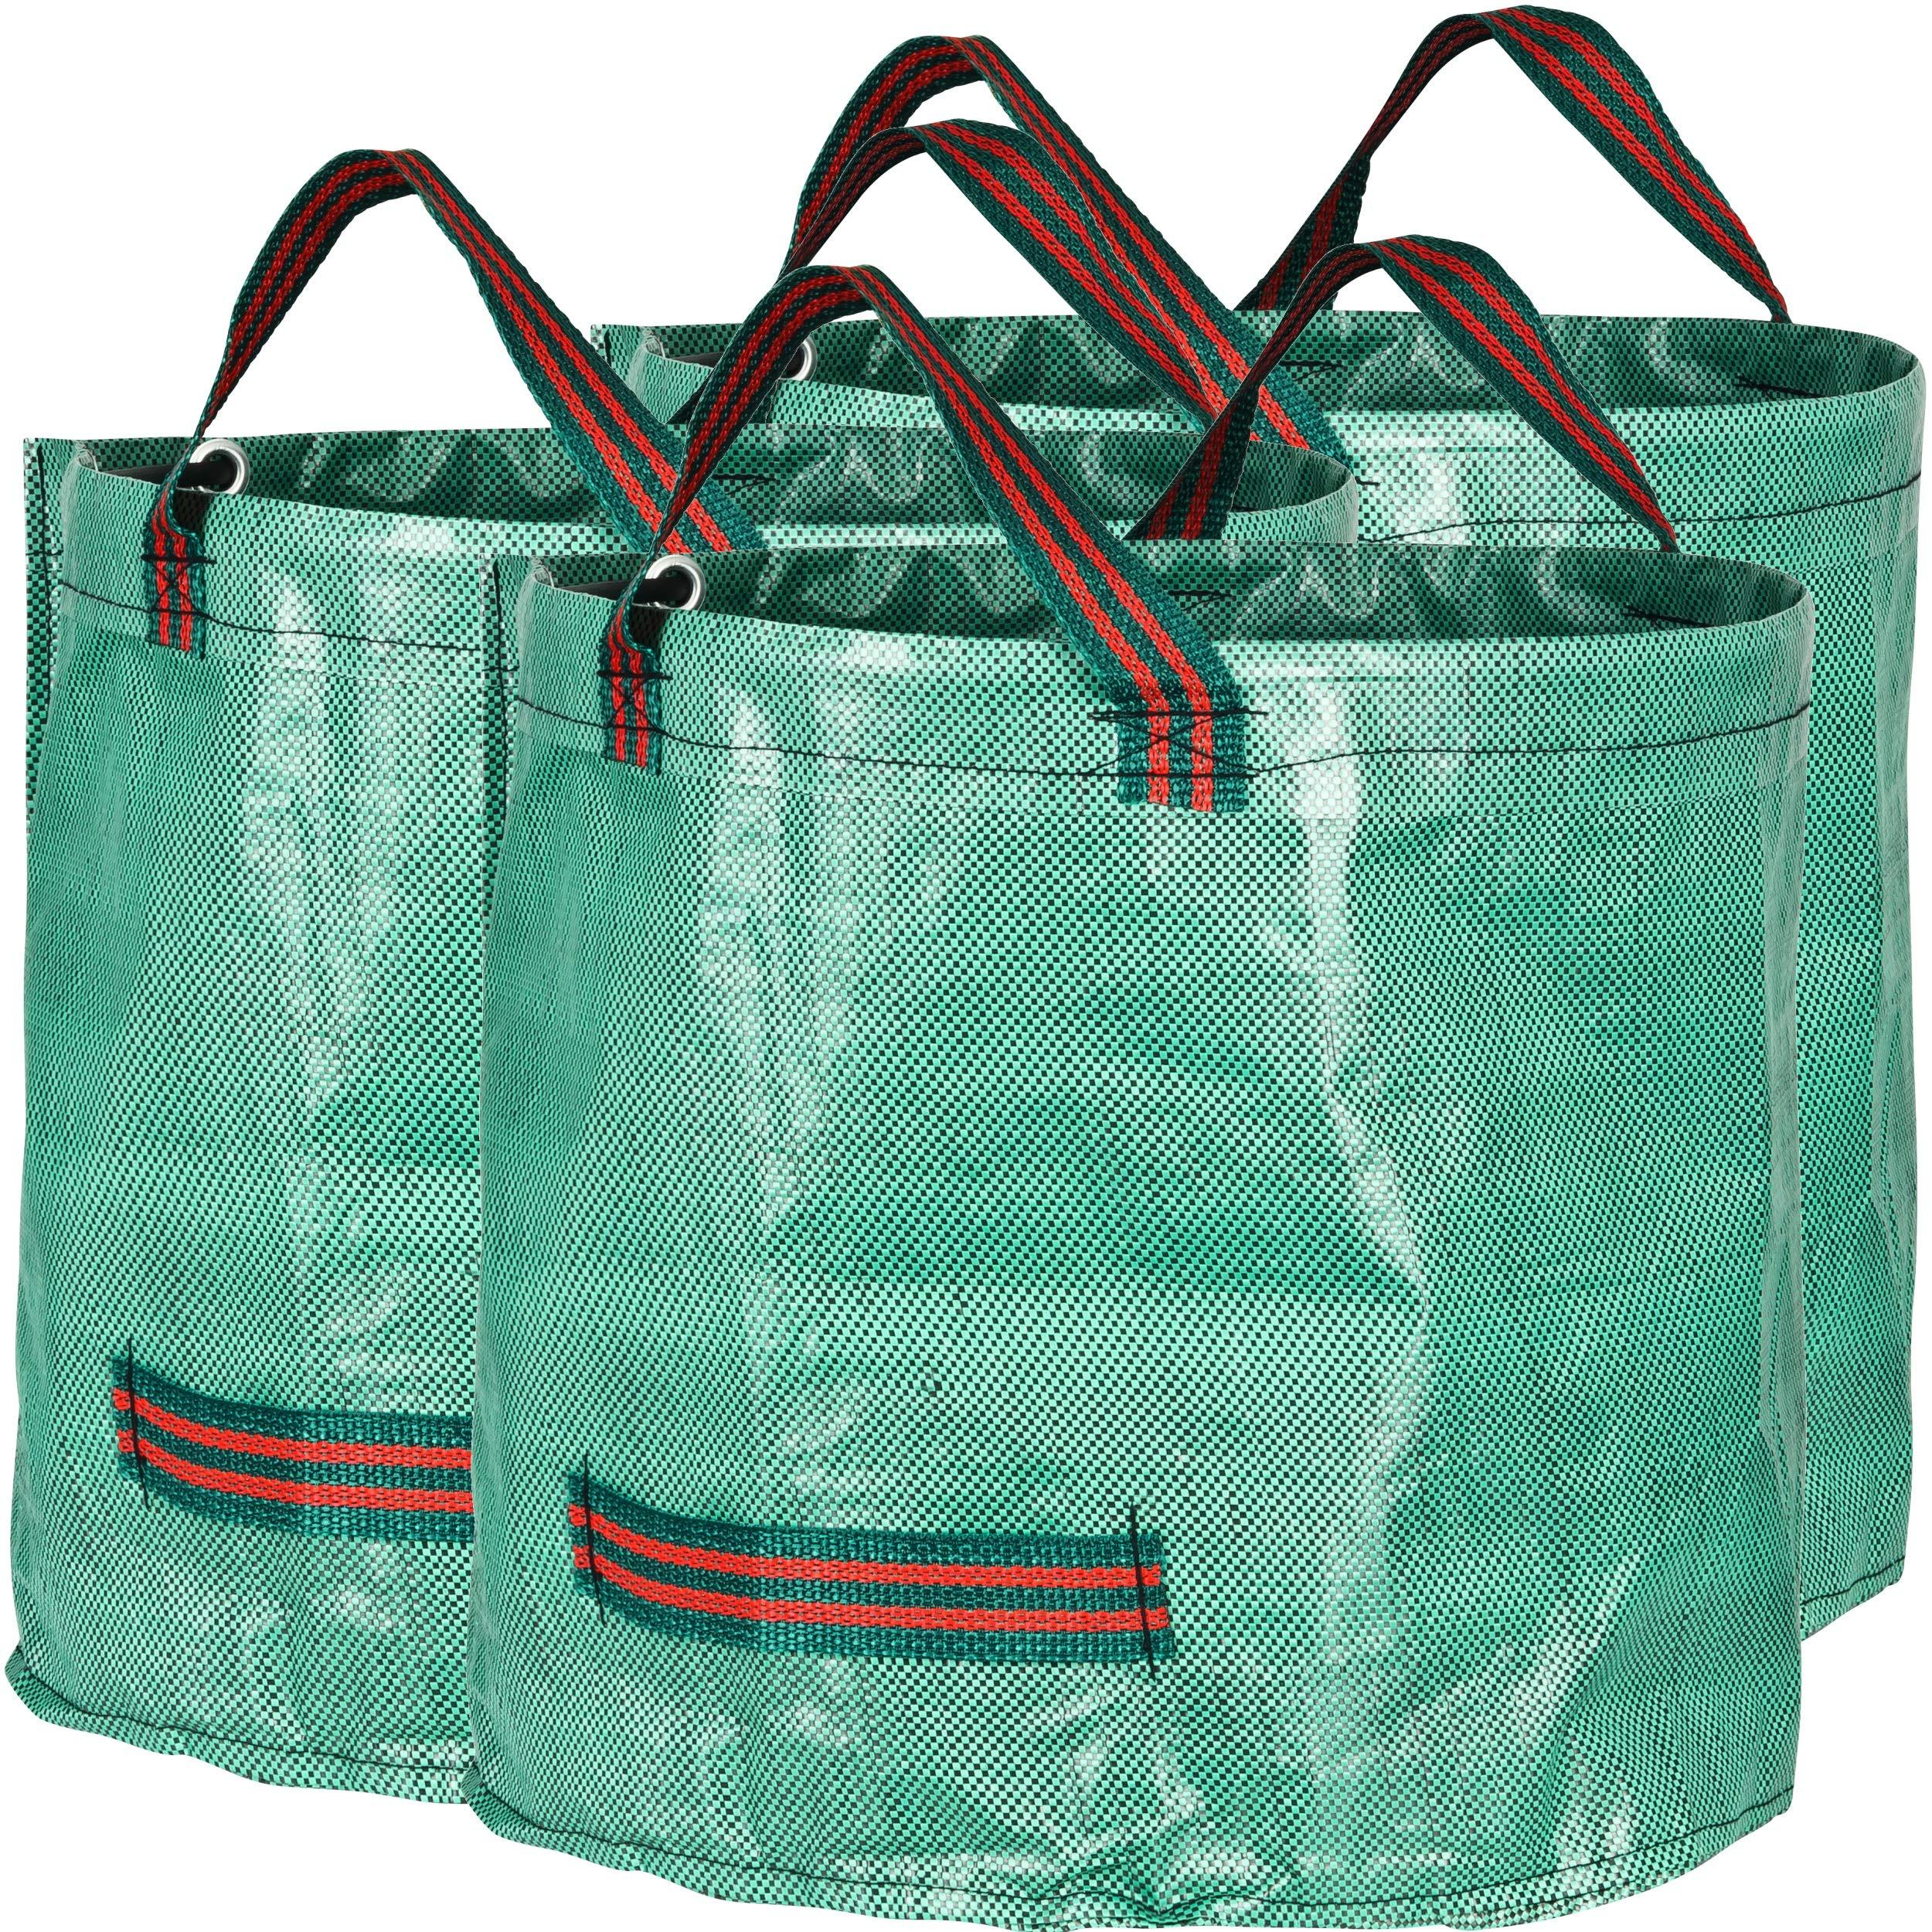 GardenMate 3-Pack 16 Gallons Garden Waste Bags